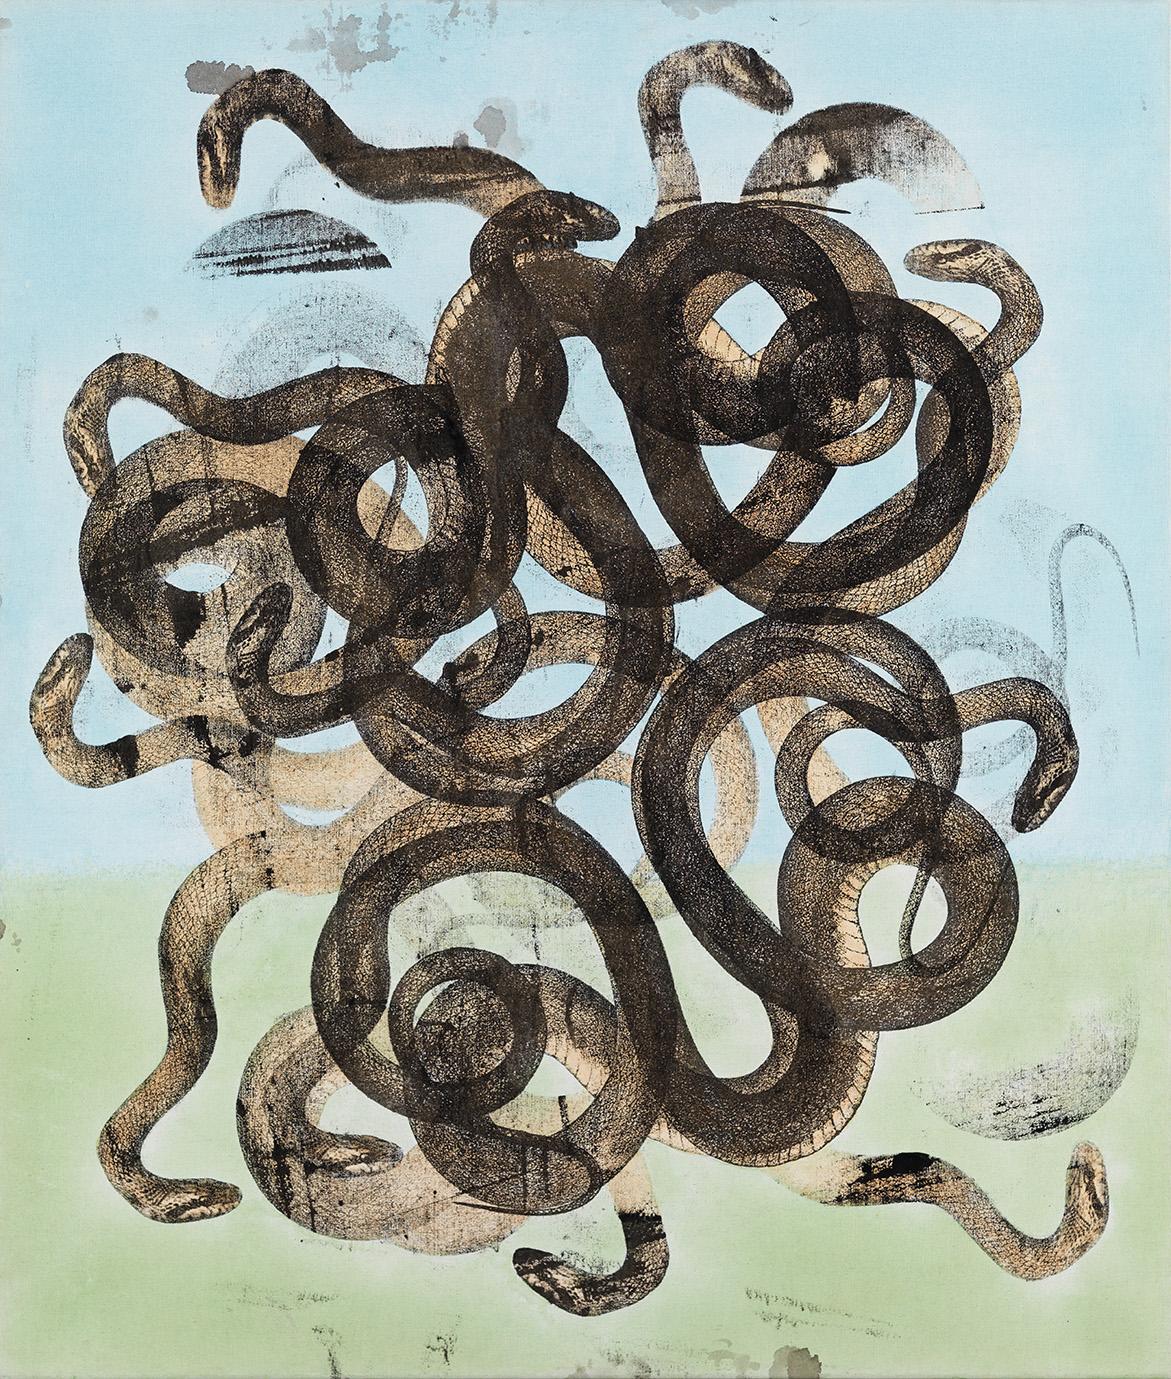 Philip Taaffe e David Aaron Angeli – Bulgari – Serpentiform